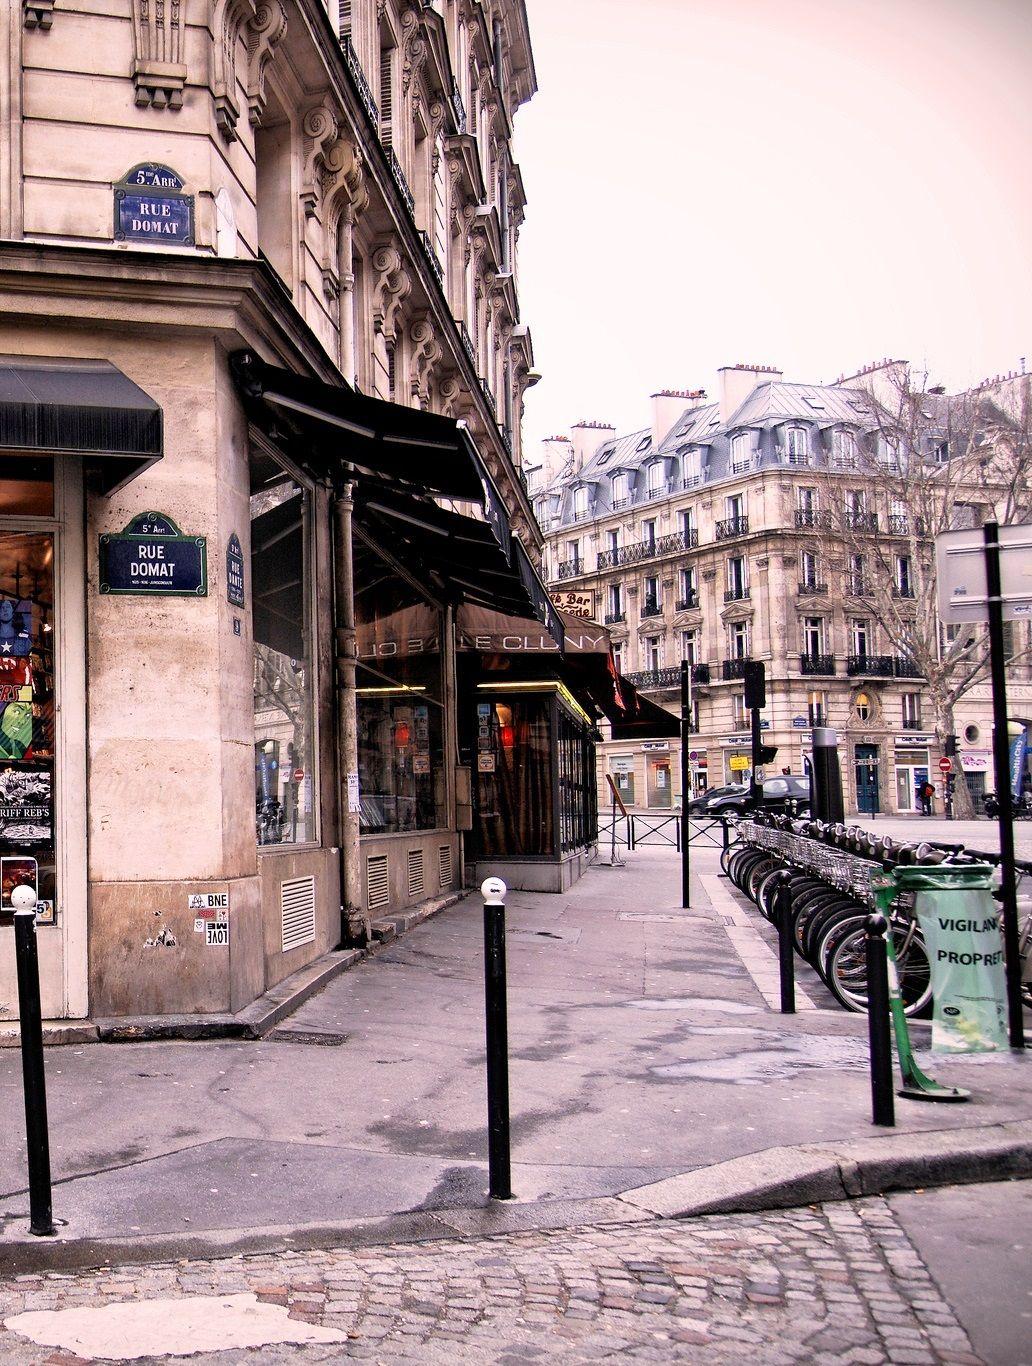 Latin Quarter, Rue Domat, Paris V